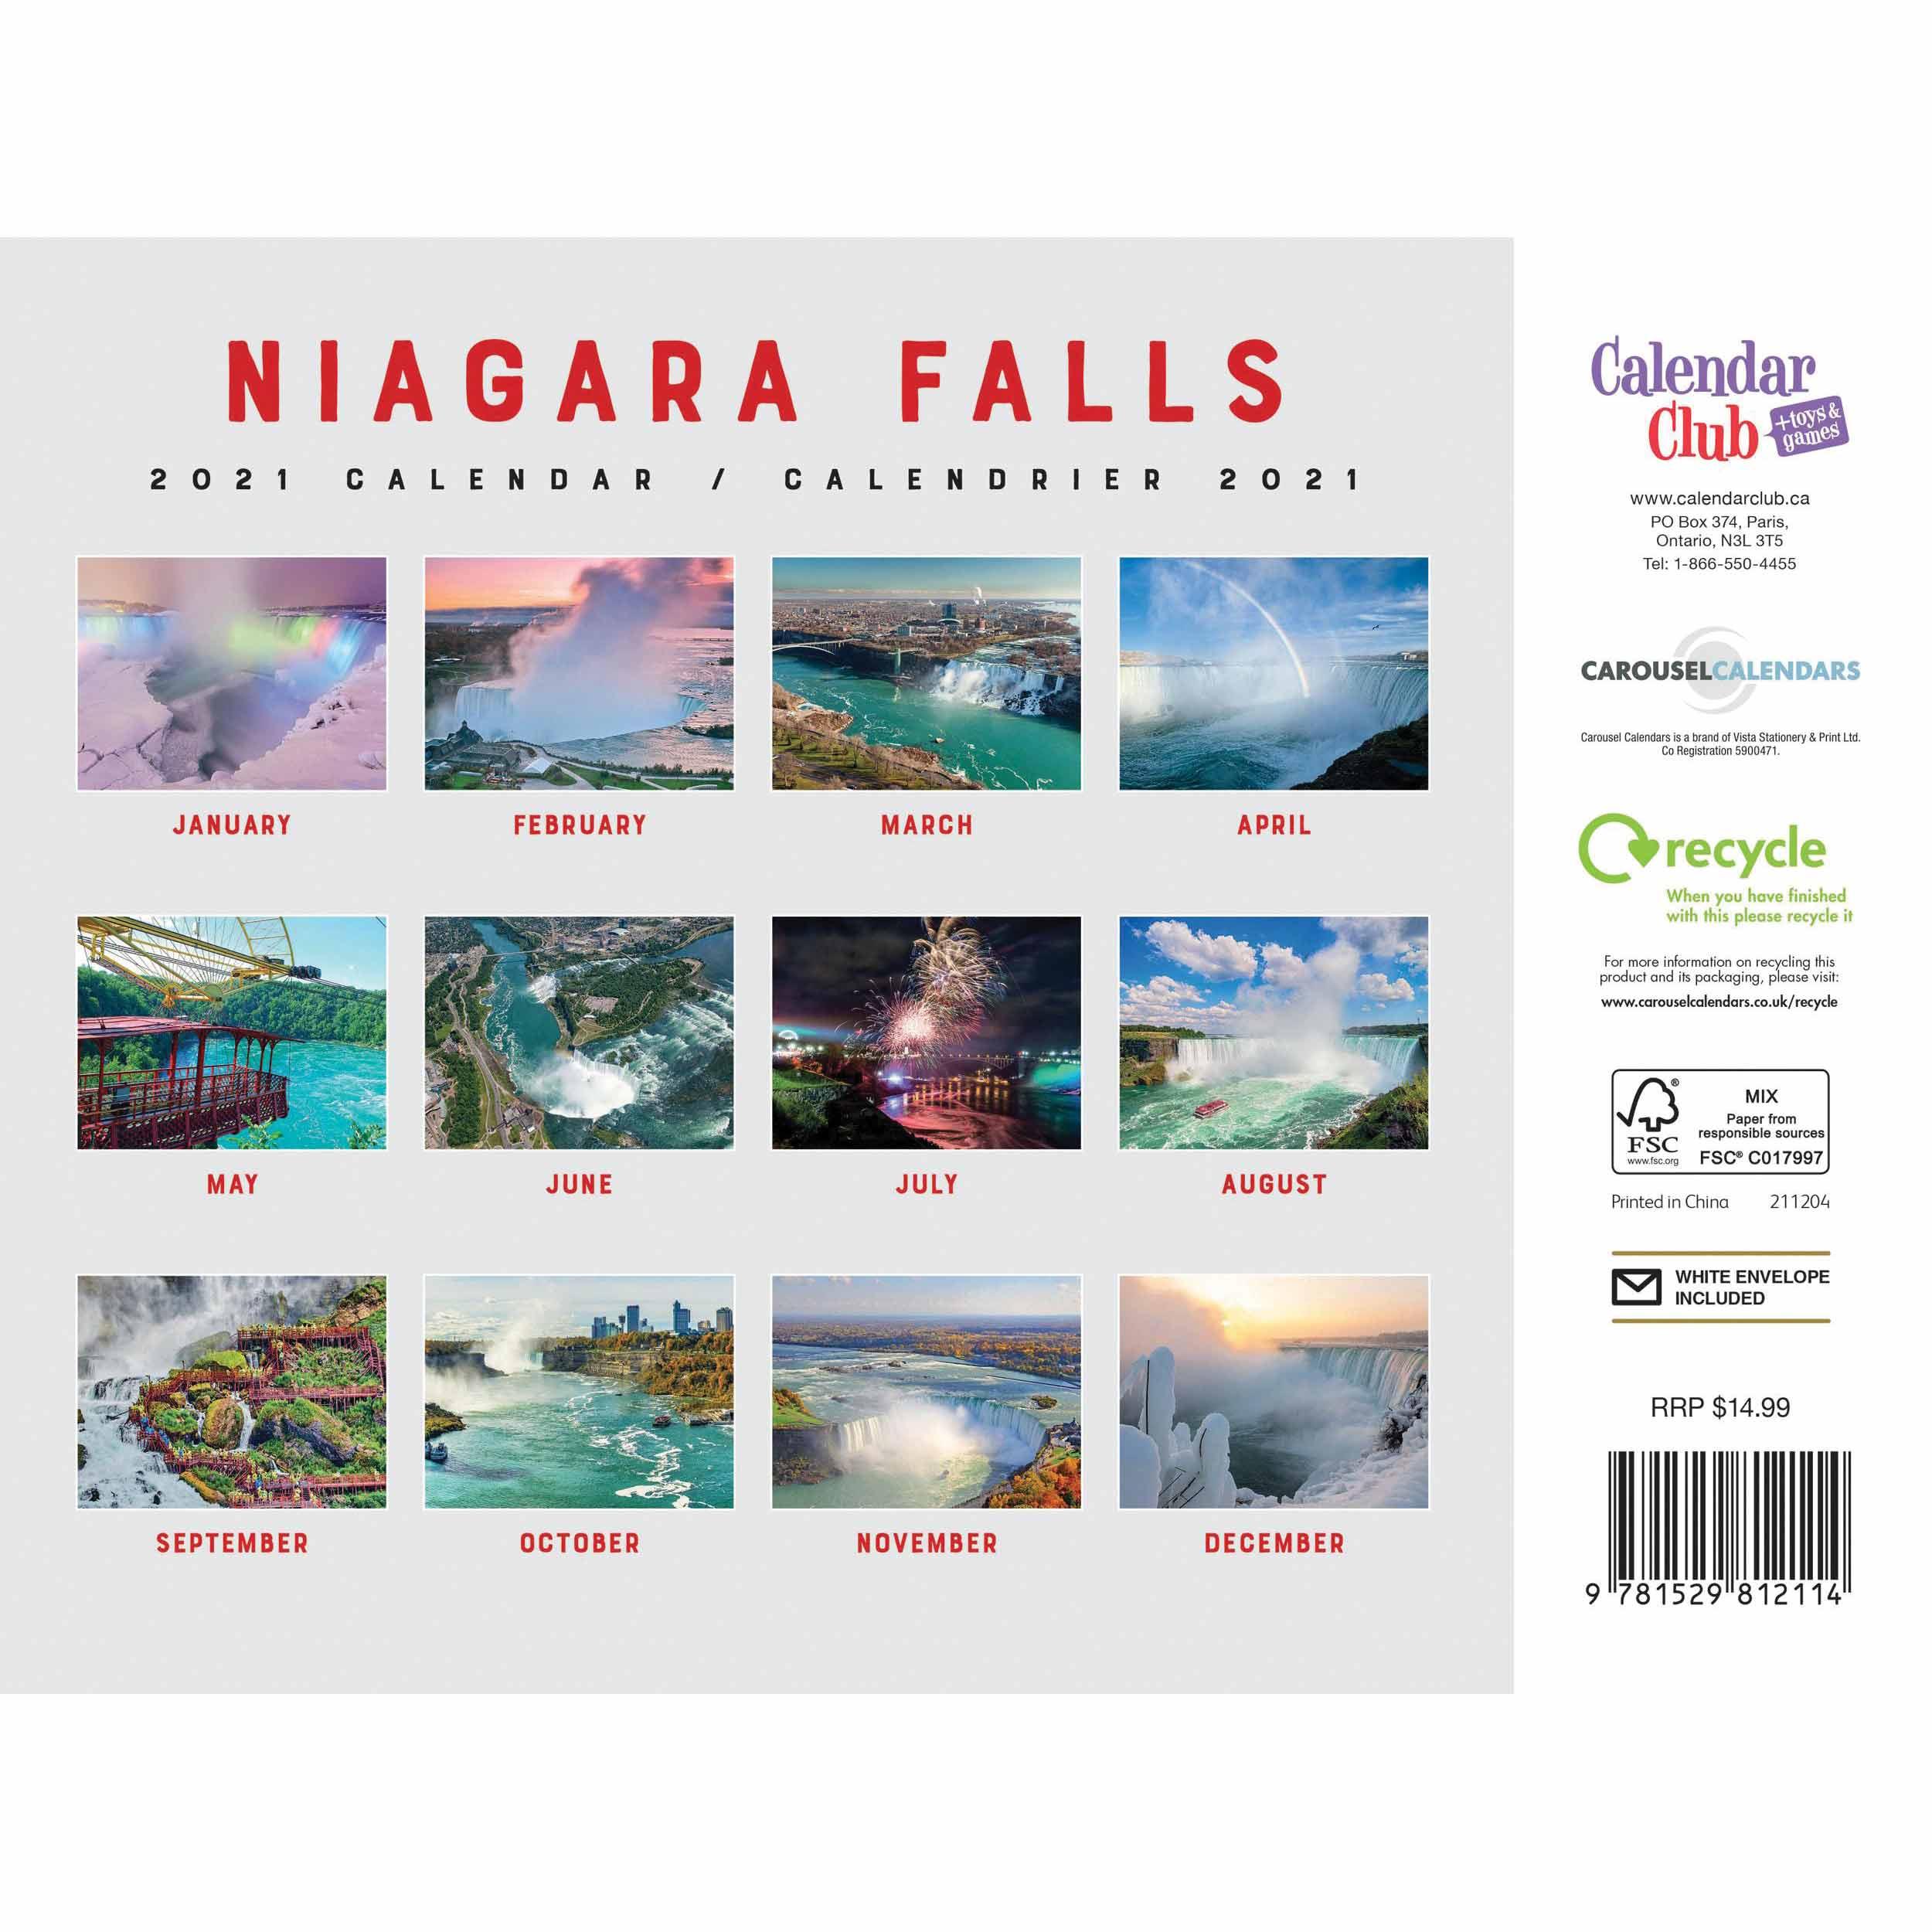 Niagara Falls A4 Calendar 2021 At Calendar Club With Niagara Falls School Calendar 2021